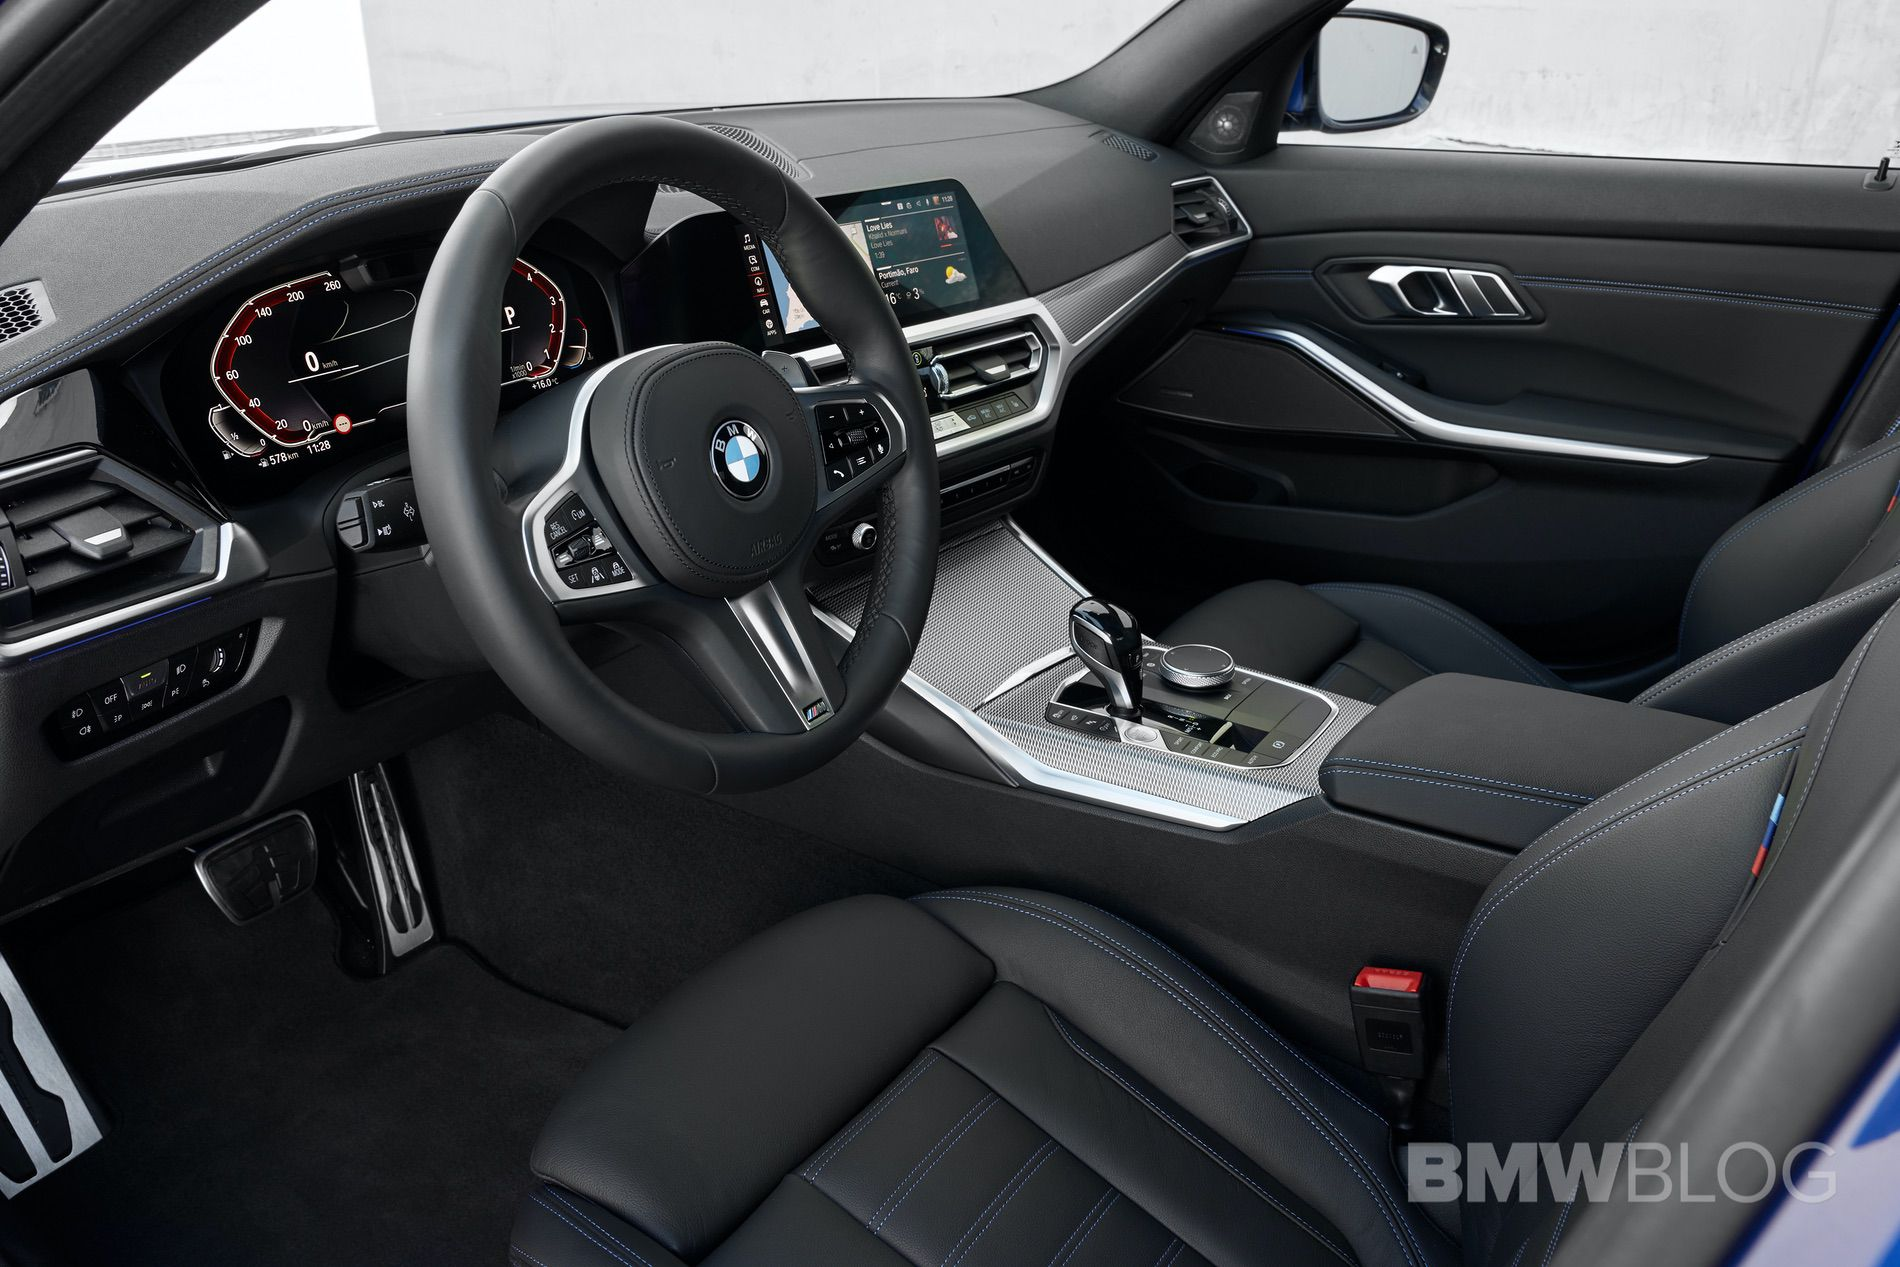 2019-BMW-330-G20-test-drive-86.jpg